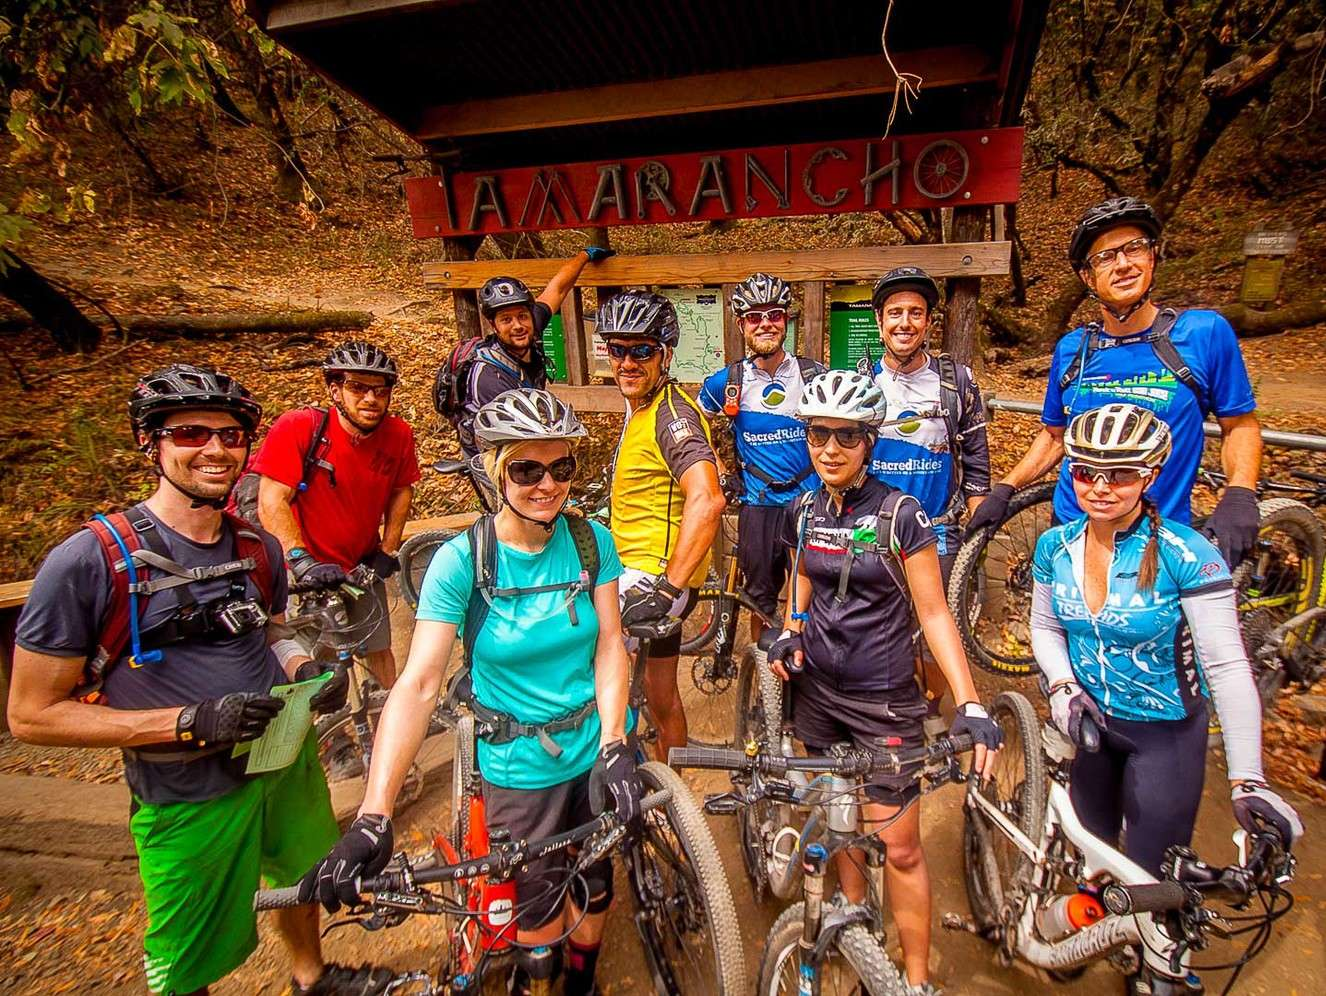 Reasons to Mountain Bike in the USA - Camp Tamarancho – Marin, California